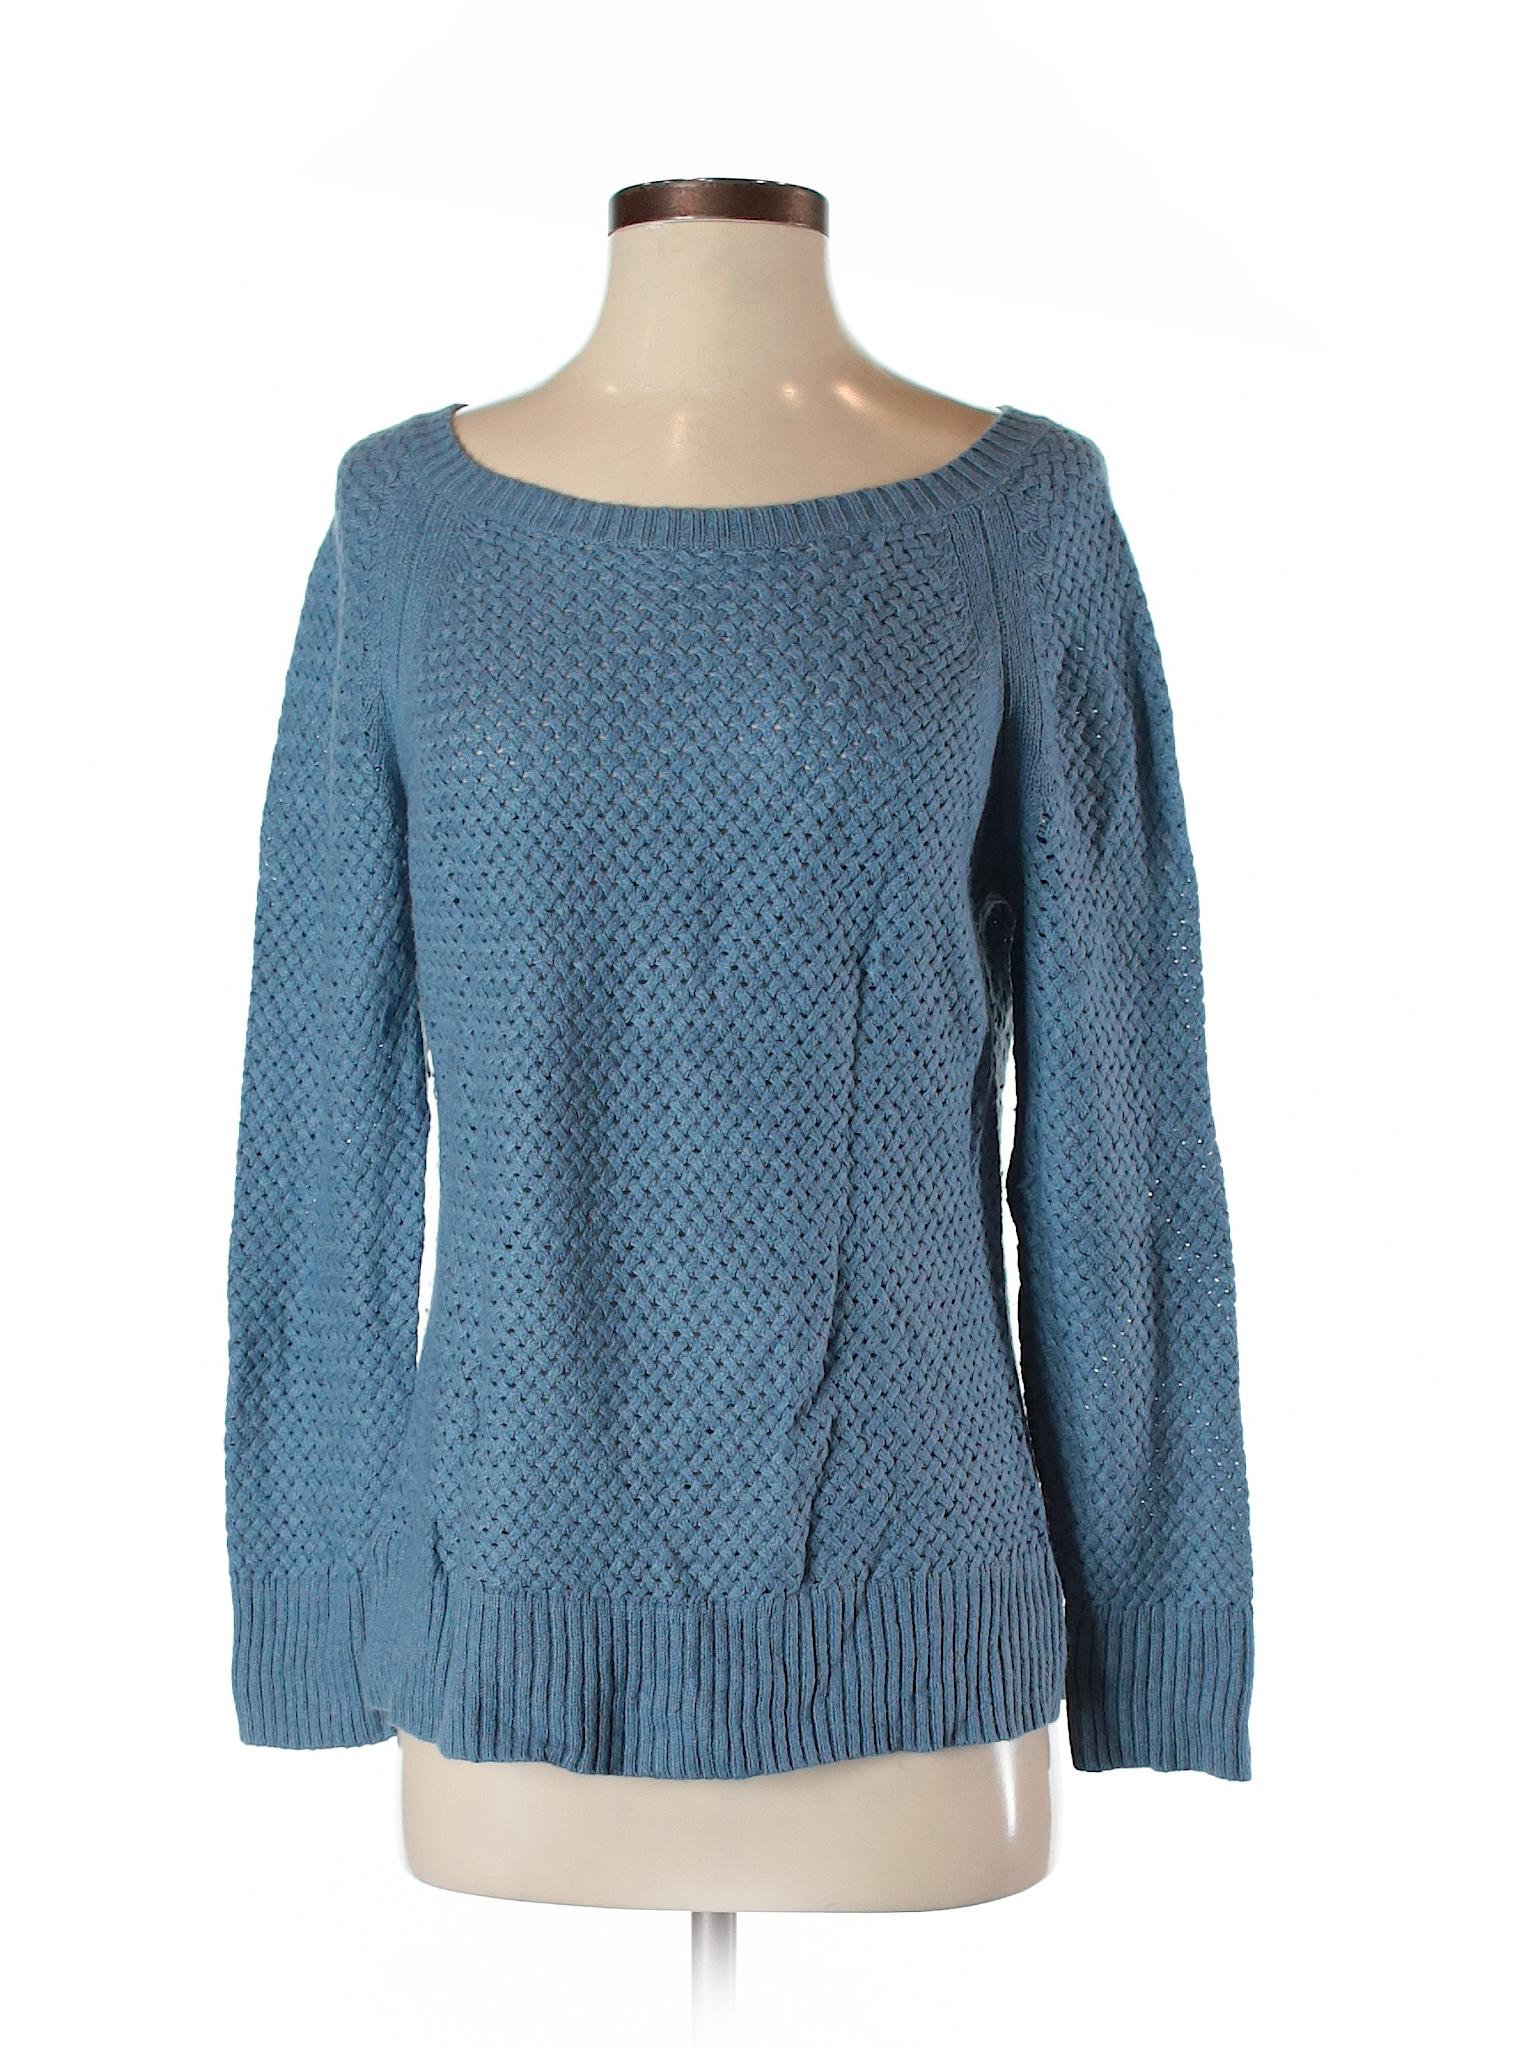 Sweater winter Boutique LOFT Taylor Ann Pullover pC4Fvx